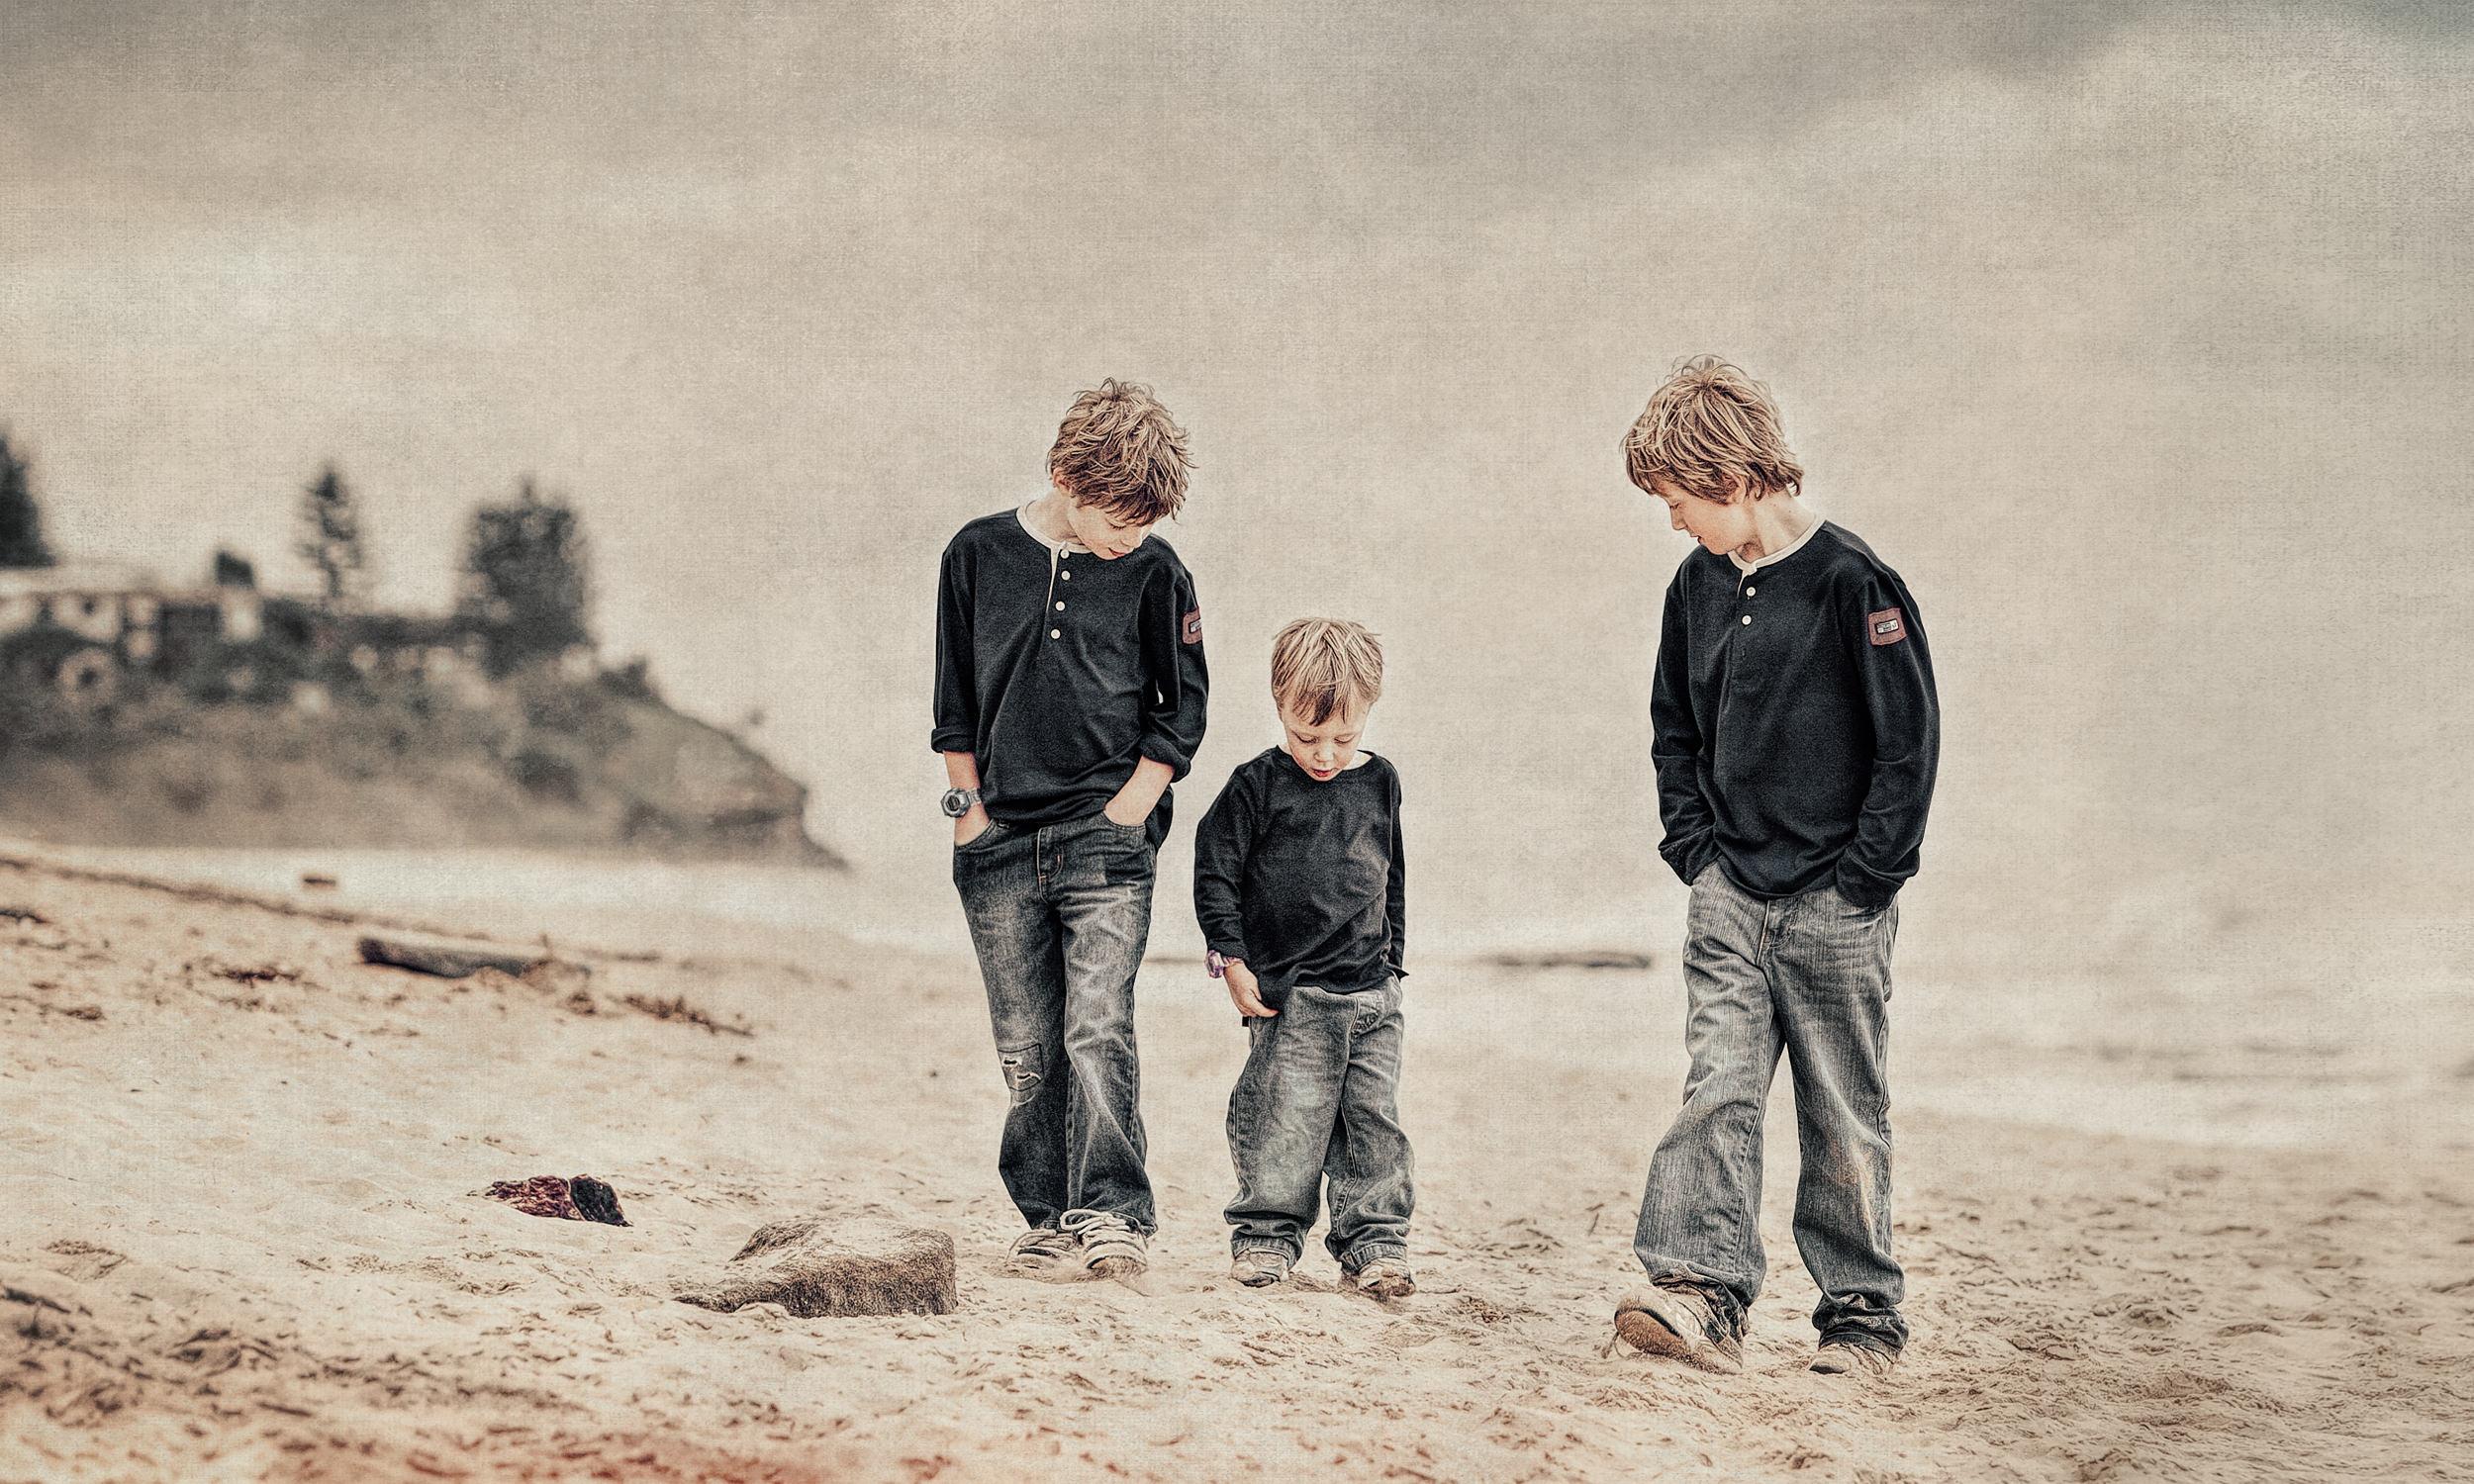 natural-light-boys-beach.jpg